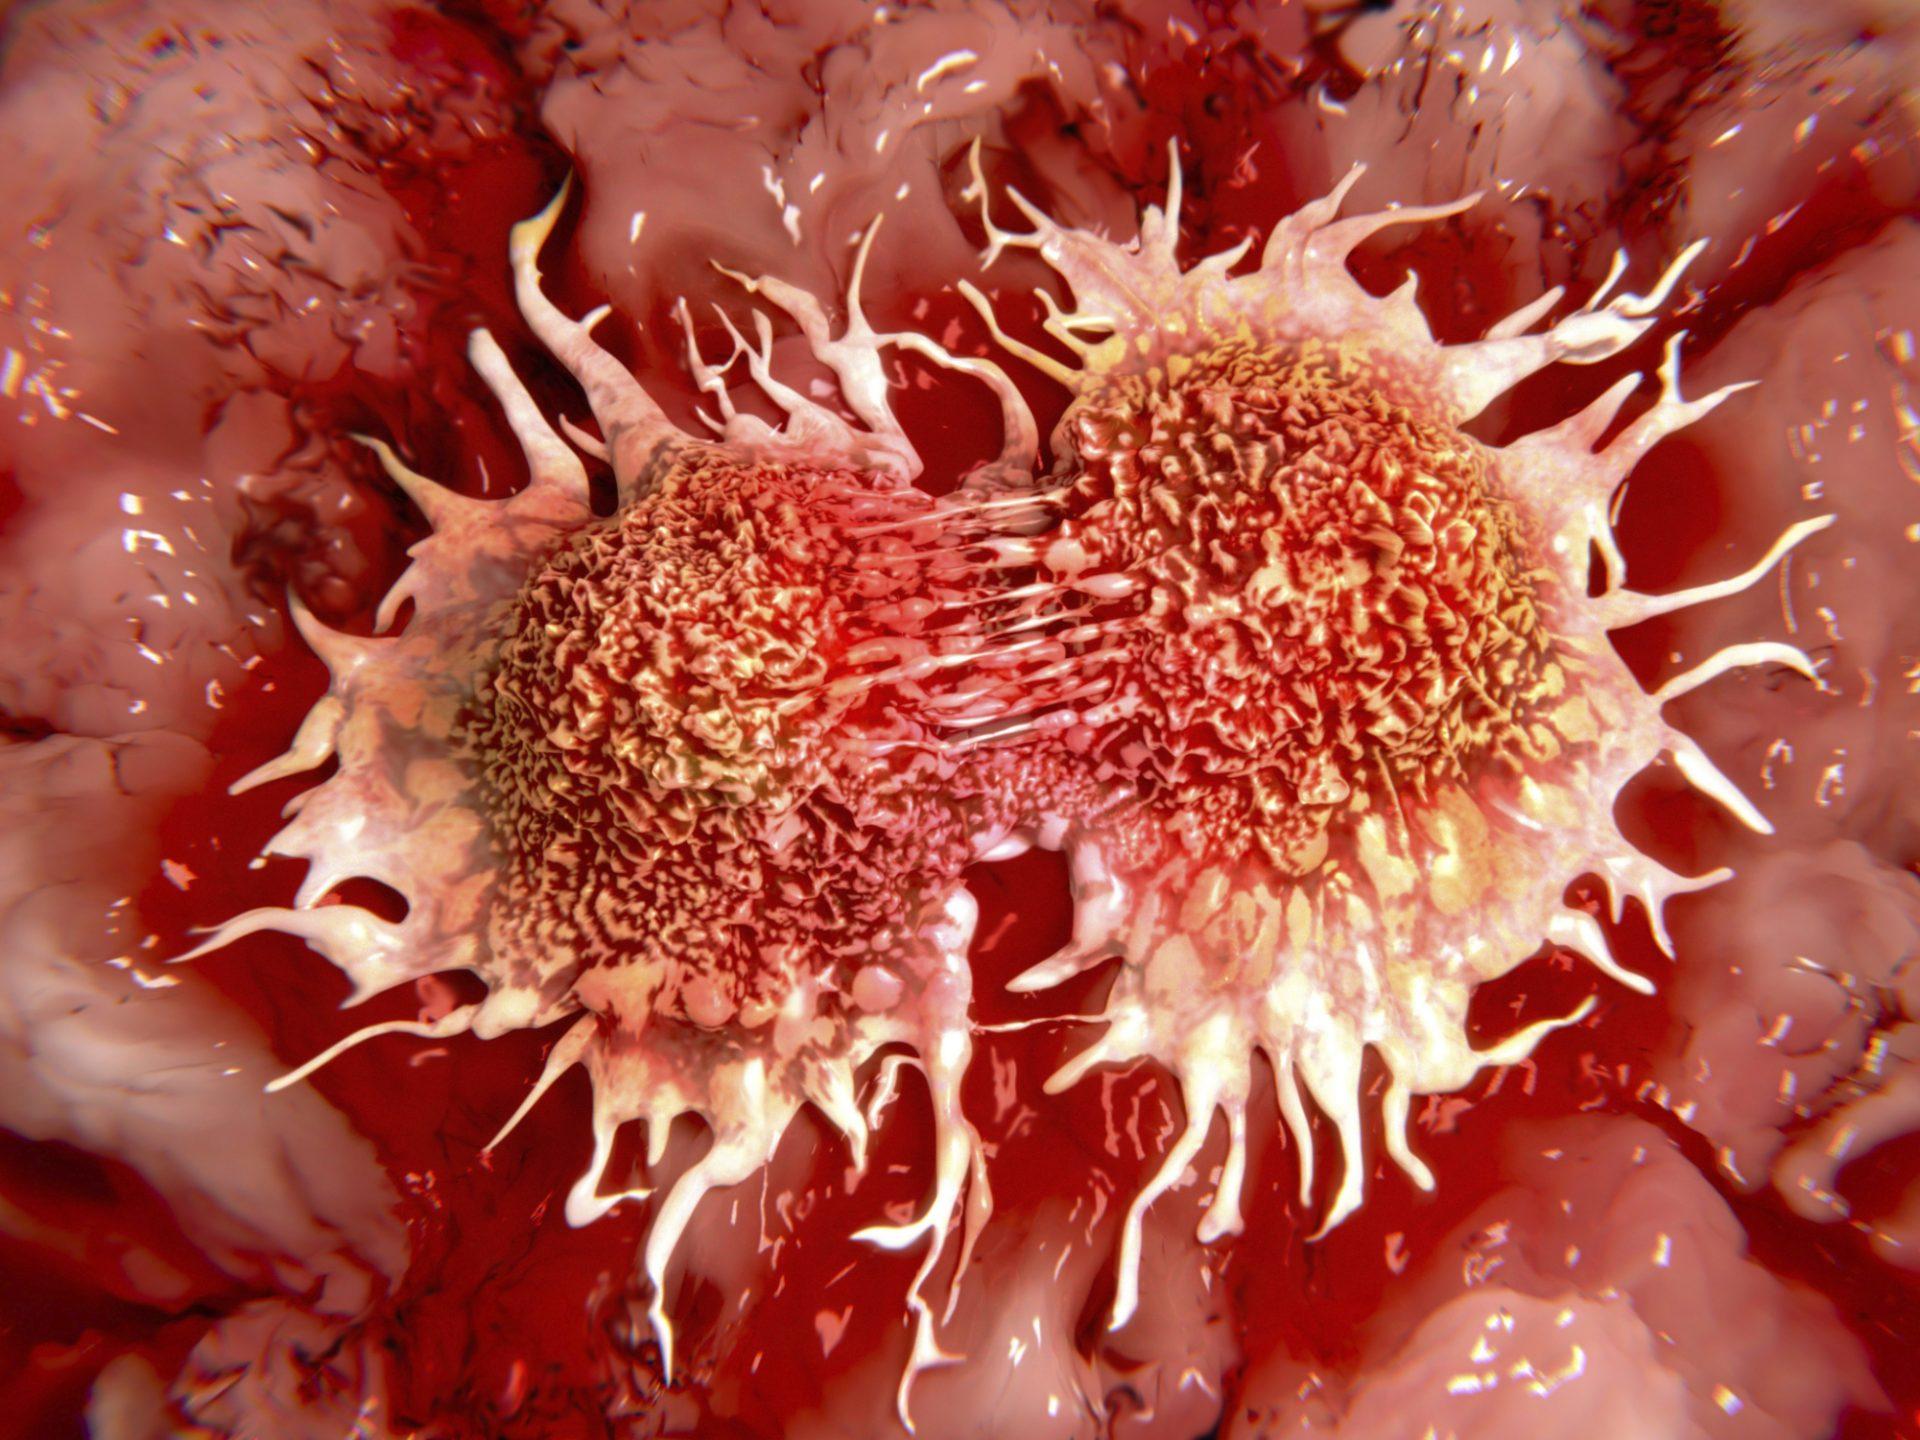 Tumor growth increases with high sugar intake ... - photo#4